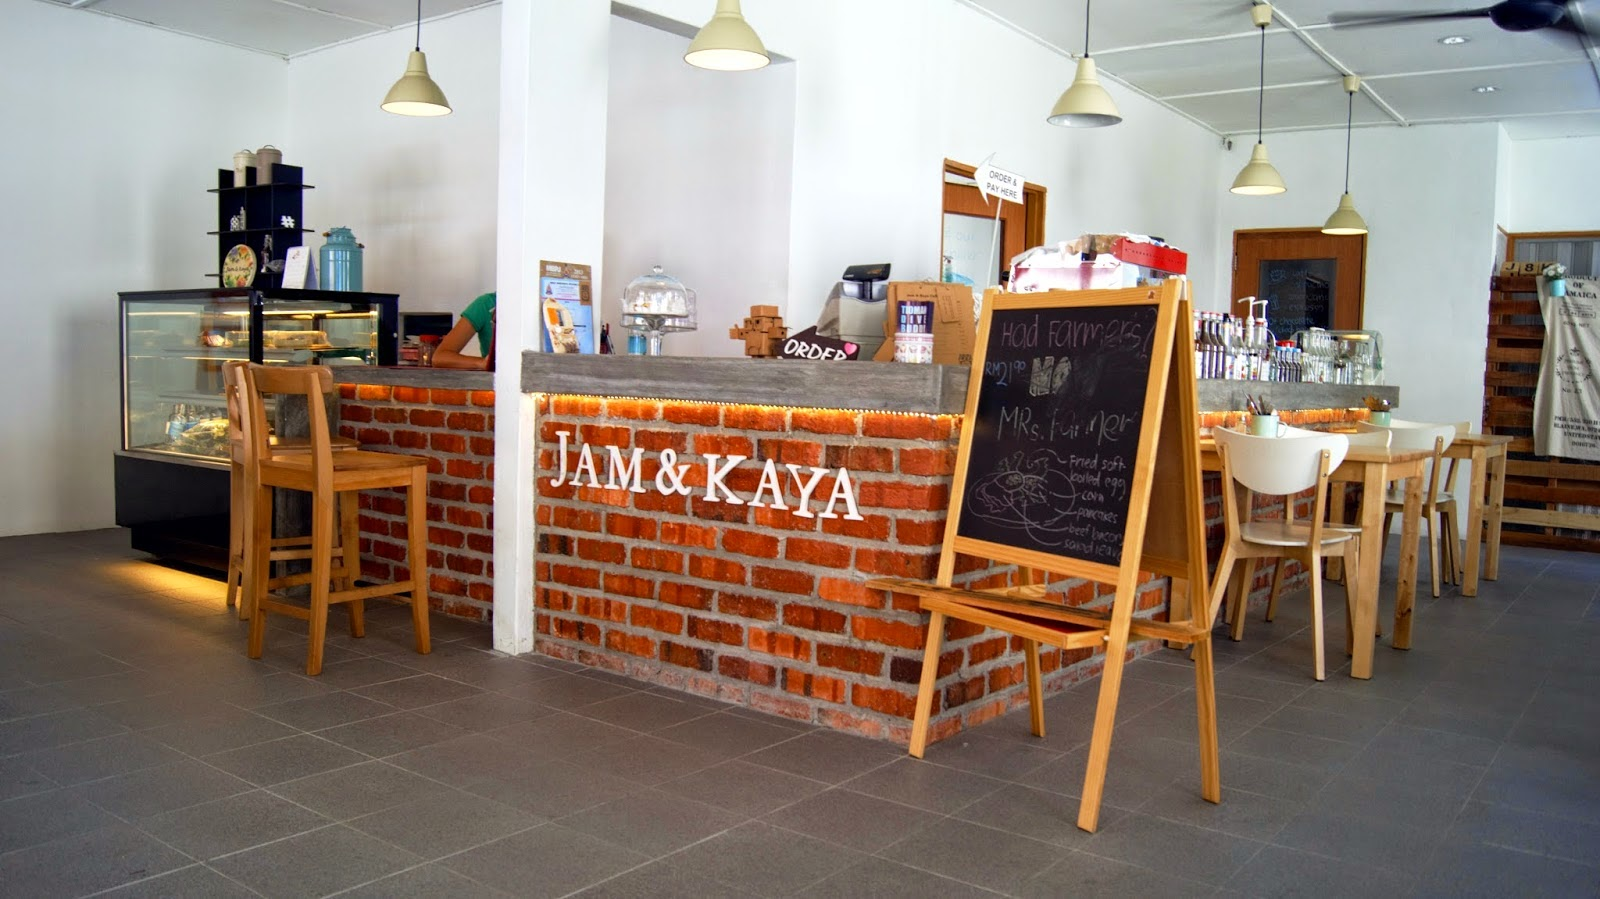 Jam Kaya Cafe Pj Palms Sports Center Pigberrypie